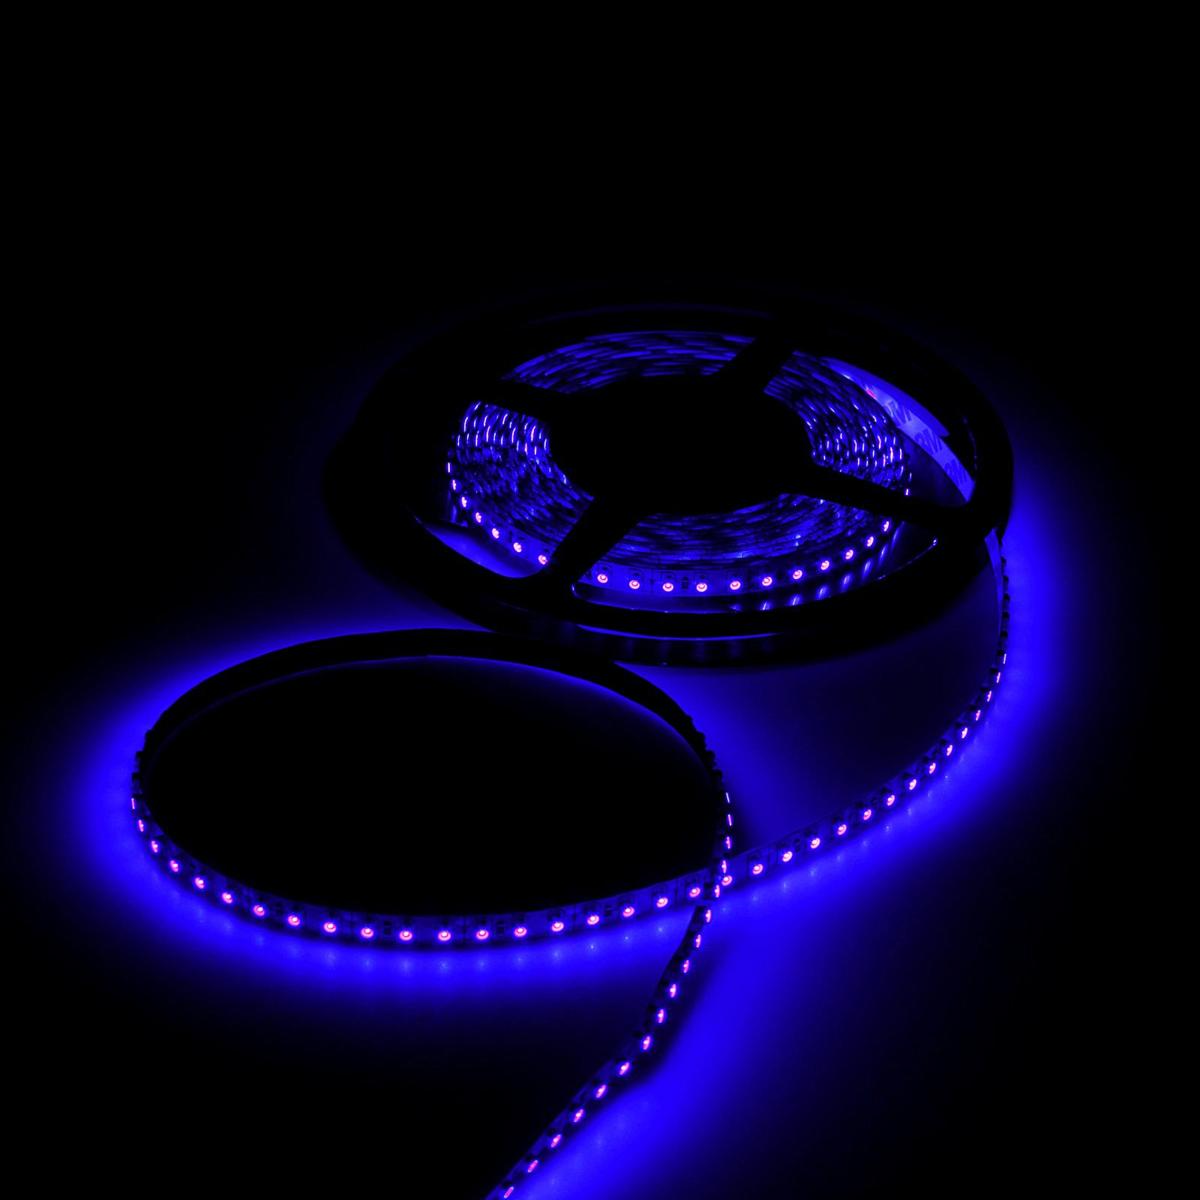 Лента светодиодная Luazon, 12В, SMD3528, длина 5 м, IP68, 60 LED ламп, 4.8 Вт/м, 6-7 Лм/1 LED, DC, цвет: синий. 883888